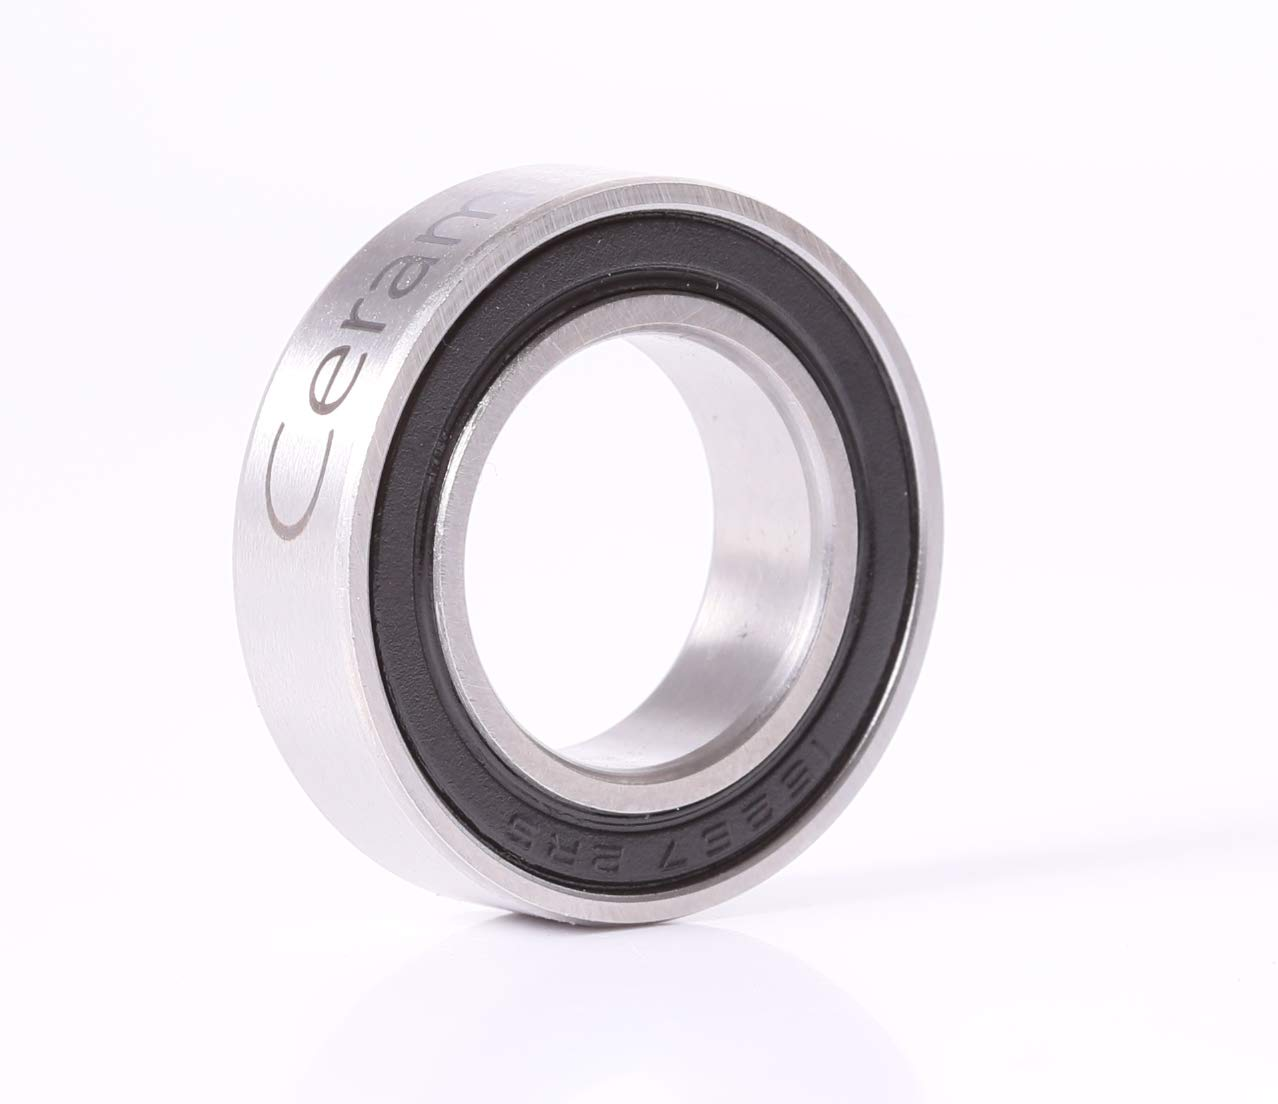 ACER Racing 15267 2RS Bearing 15x26x7 Si3N4 Ceramic Sealed Ball Bearings